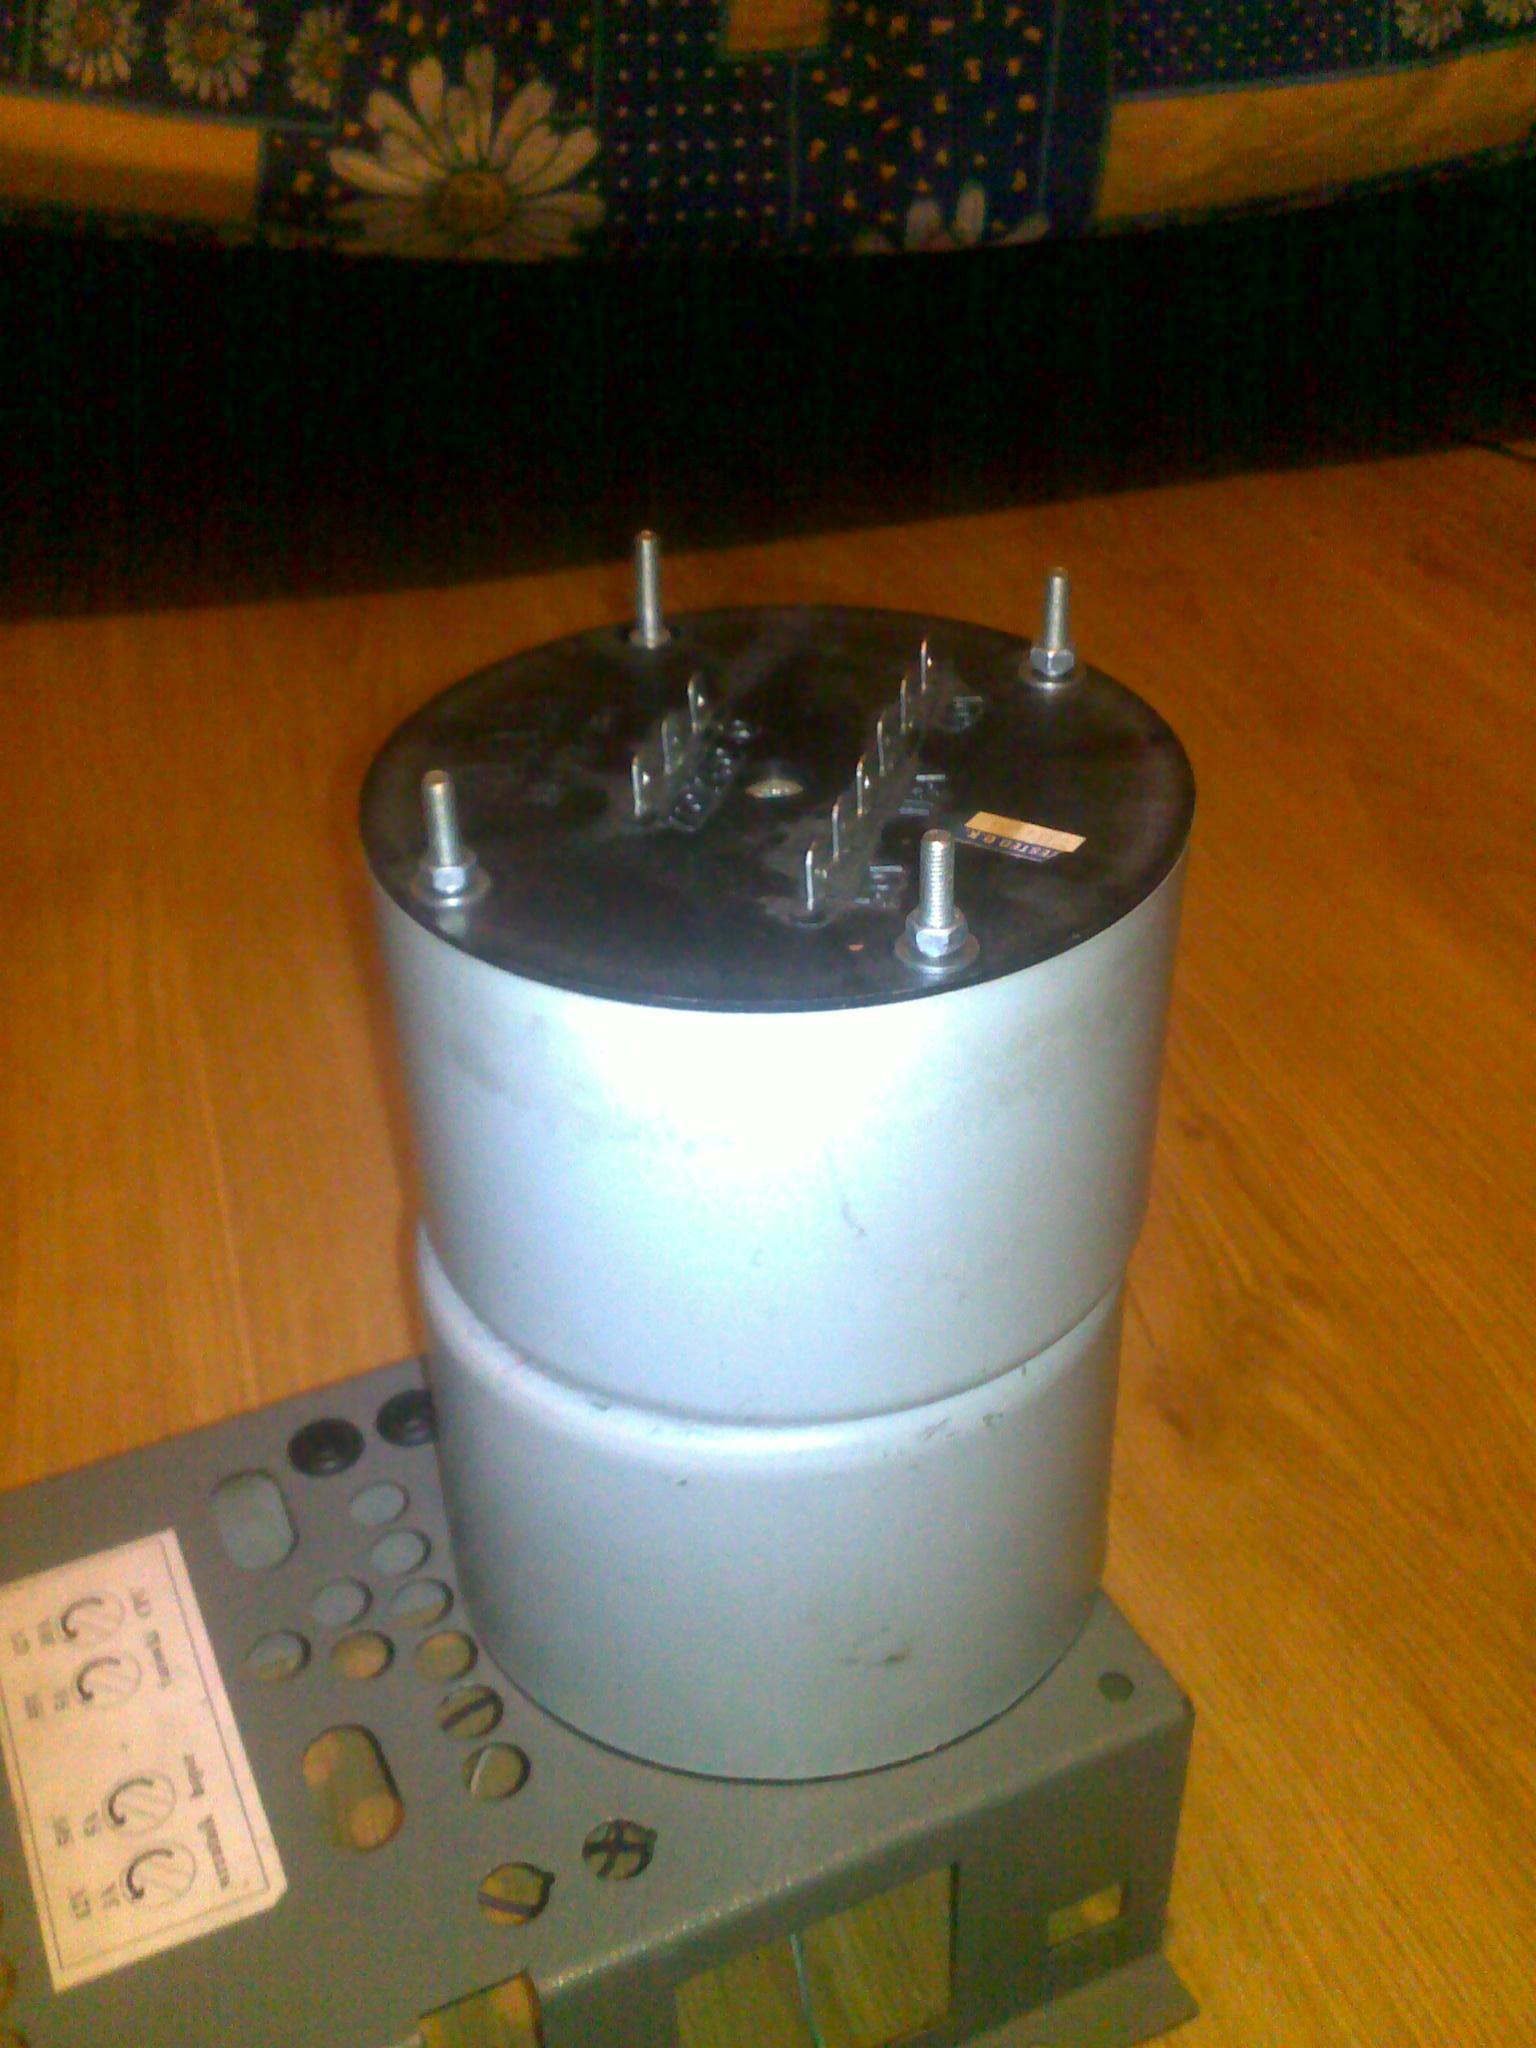 [Sprzedam] Dwa Transformatory wielonapieciowe 12V 40V 50V Holton